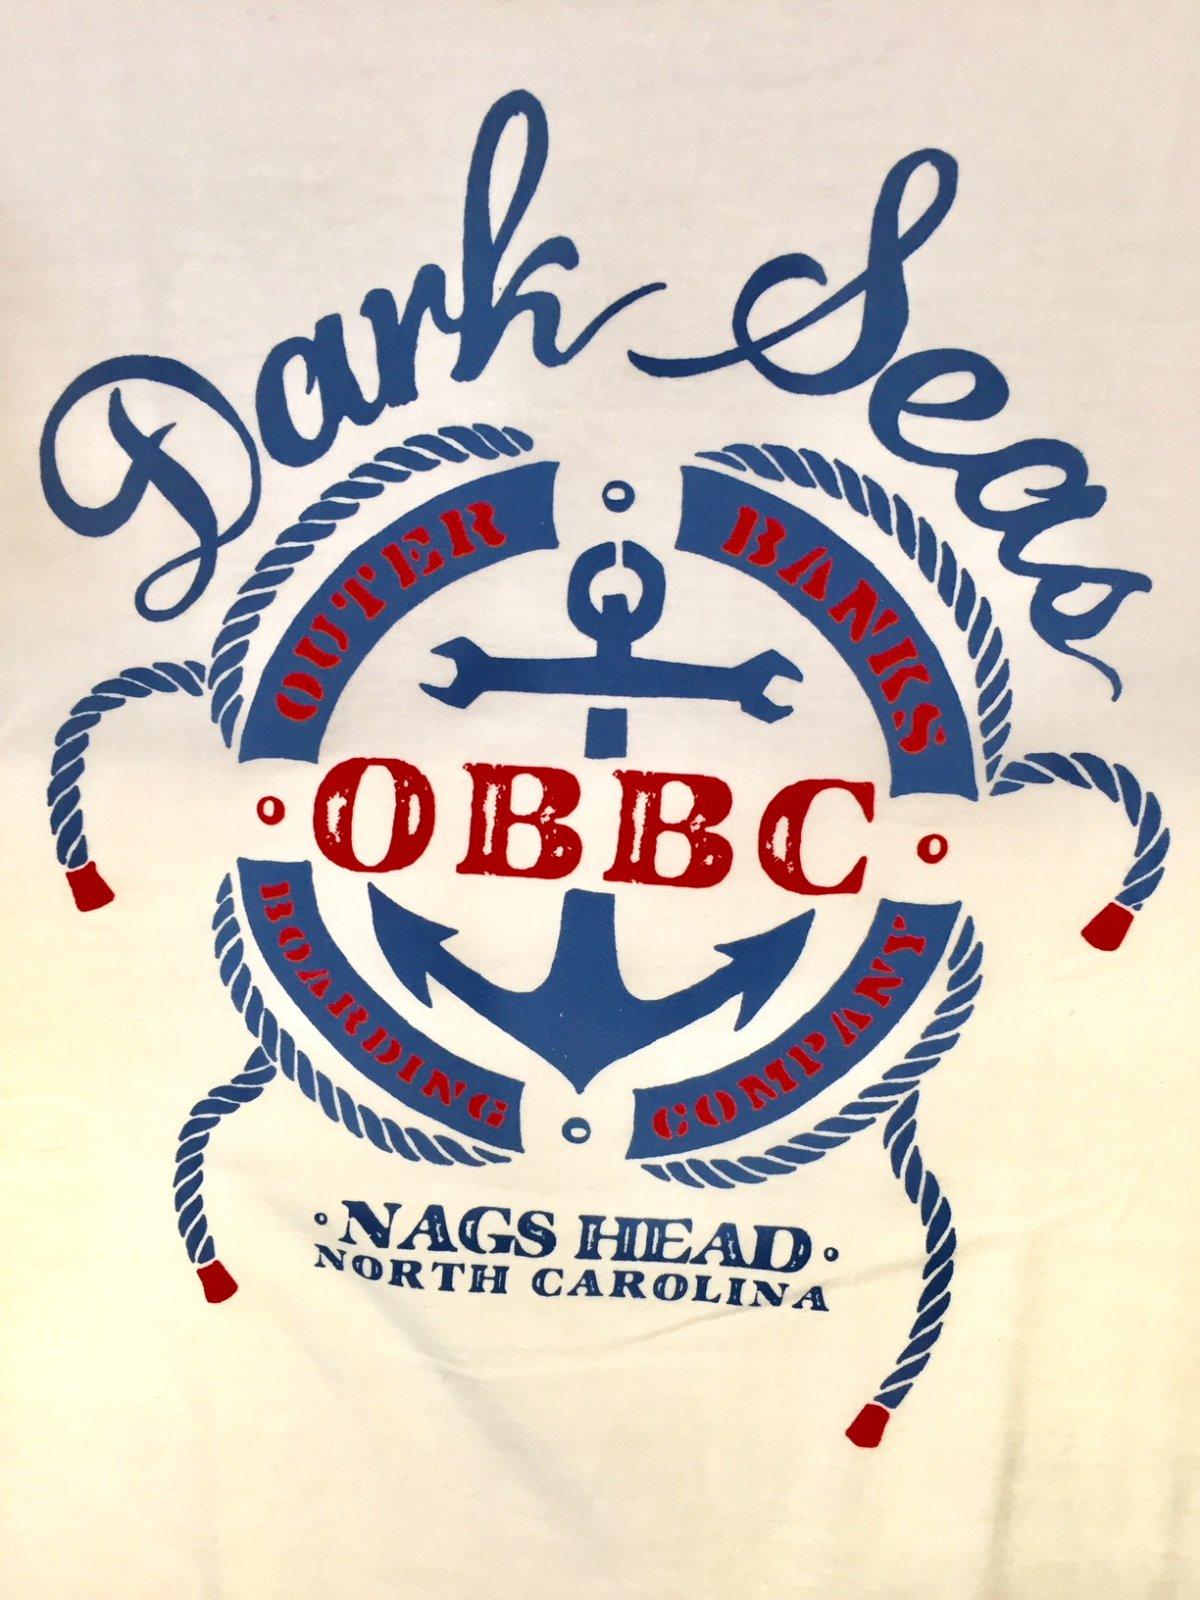 Dark Seas x OBBC S&R Premium Tee White